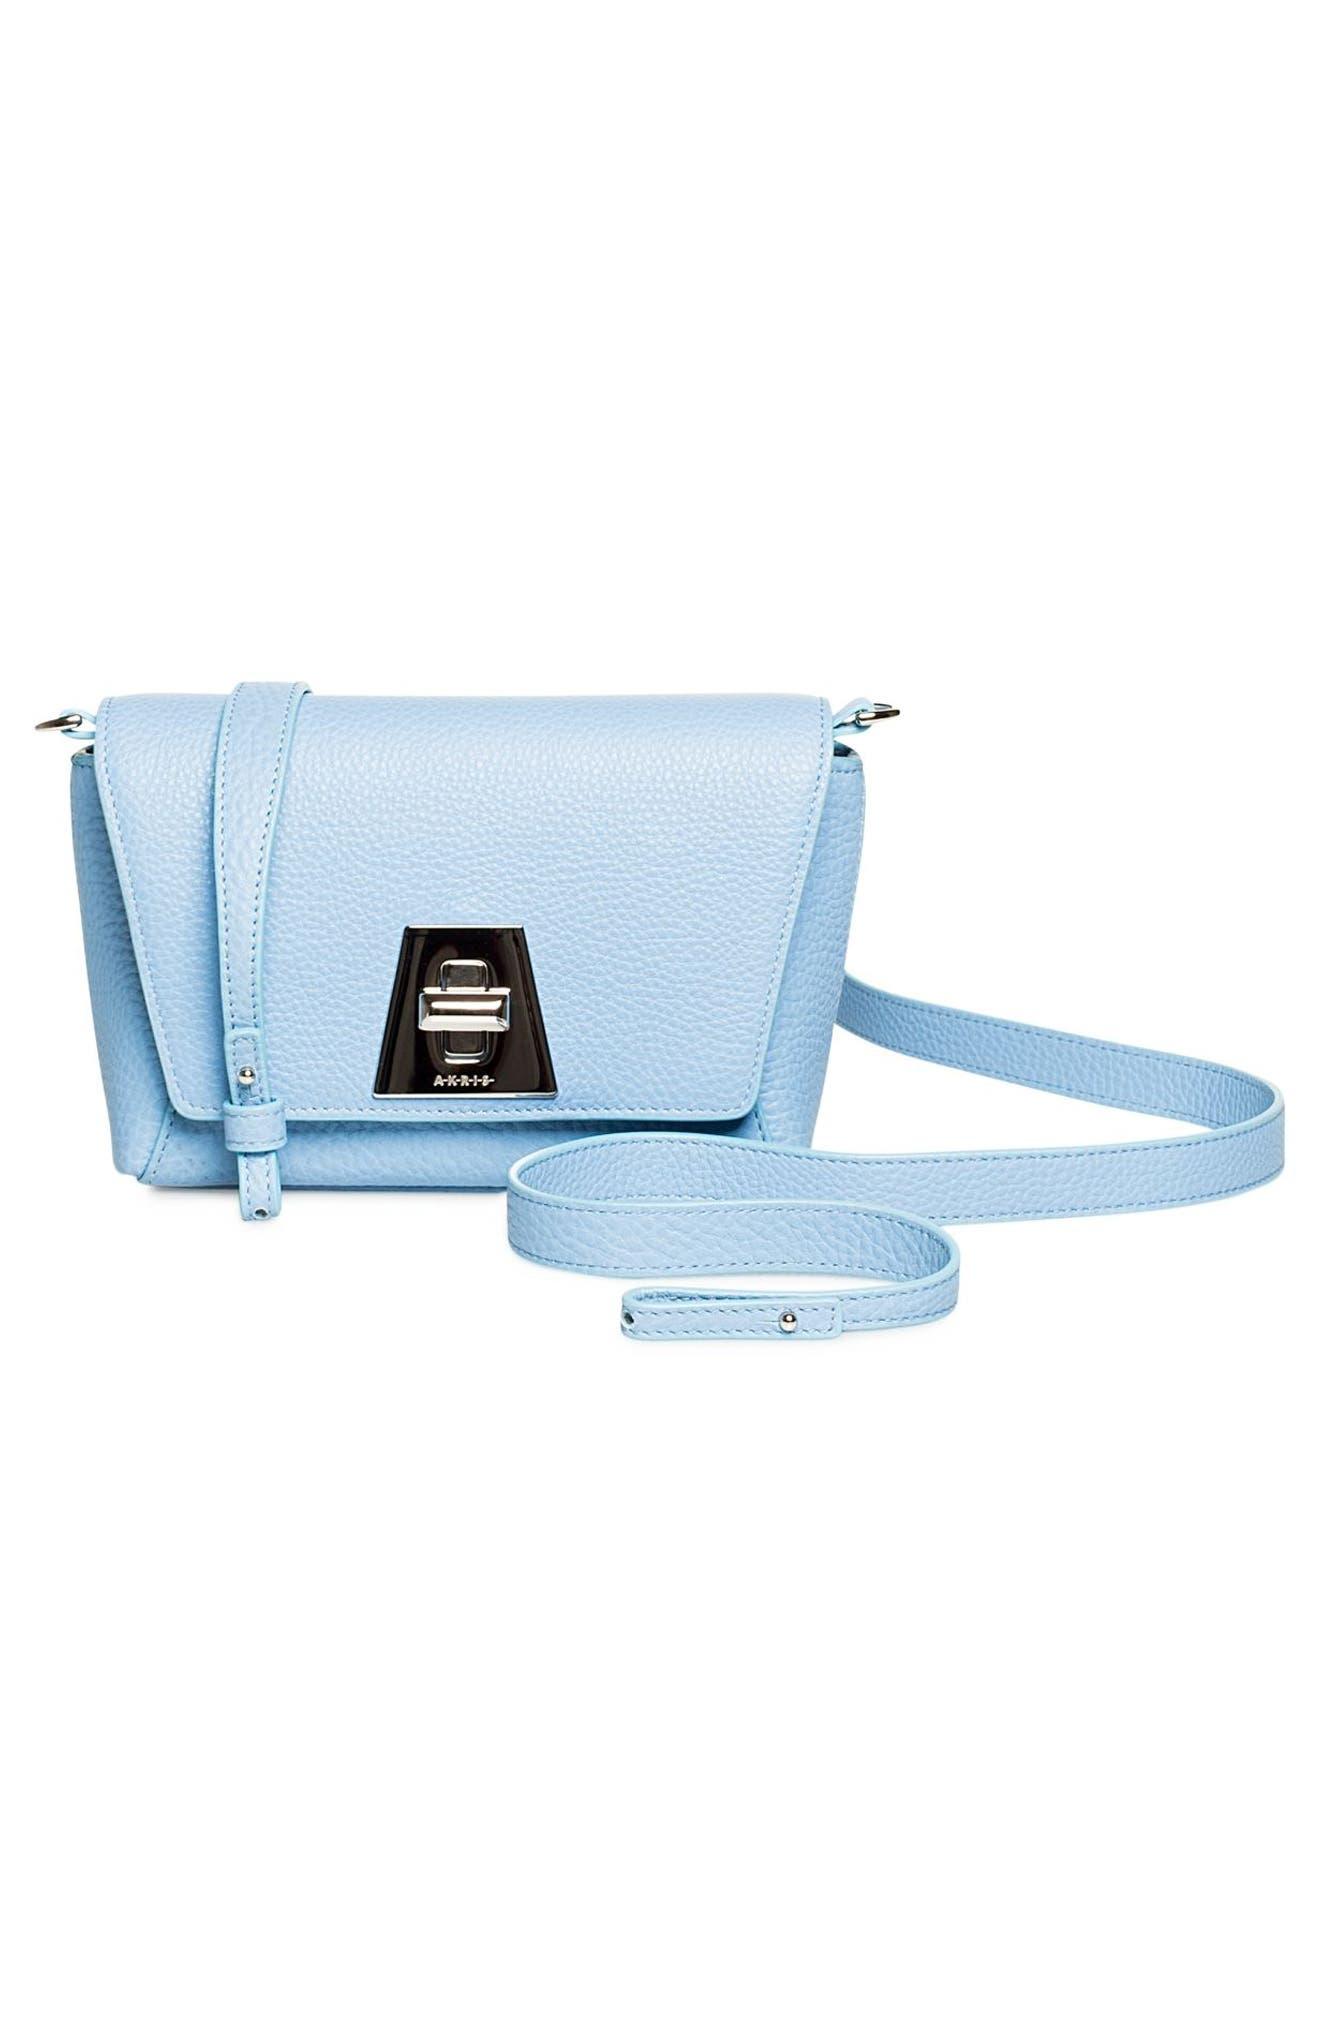 Little Anouk Calfskin Crossbody Bag,                             Alternate thumbnail 3, color,                             POWDER BLUE